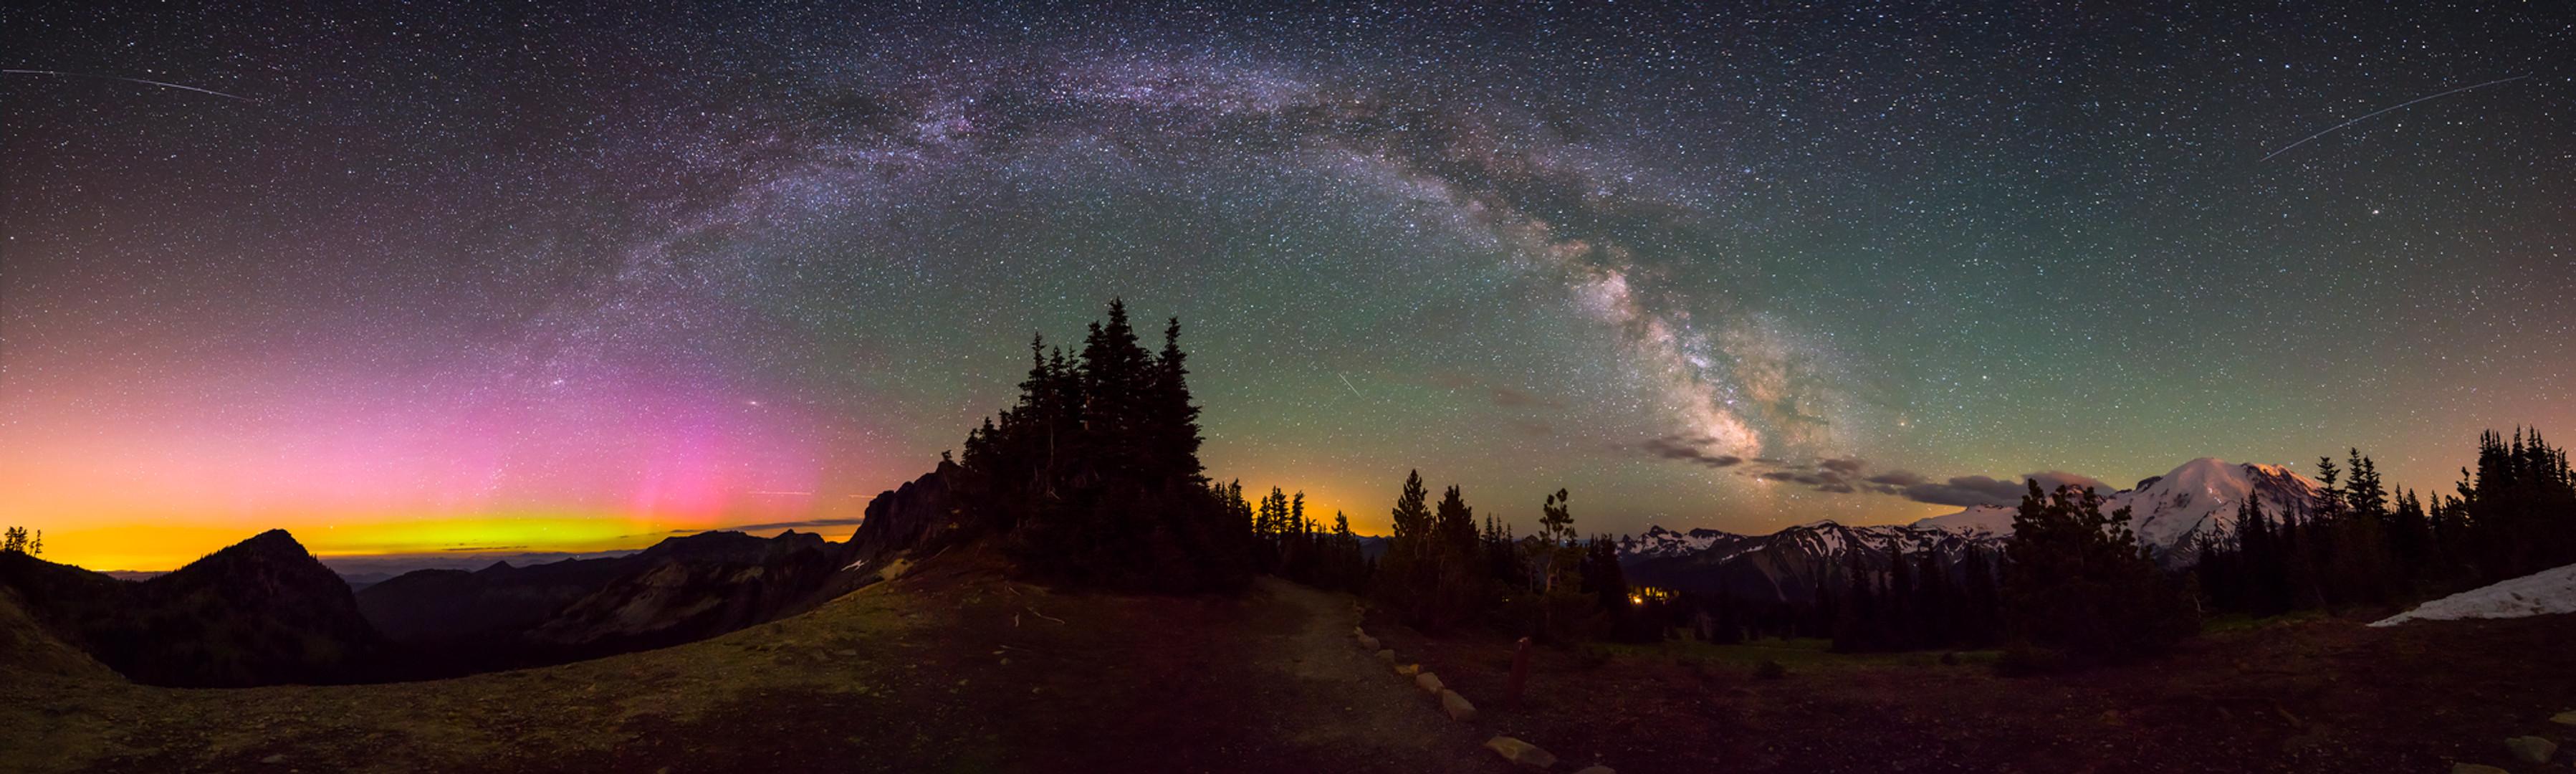 Milky Way with Aurora from Mount Rainier